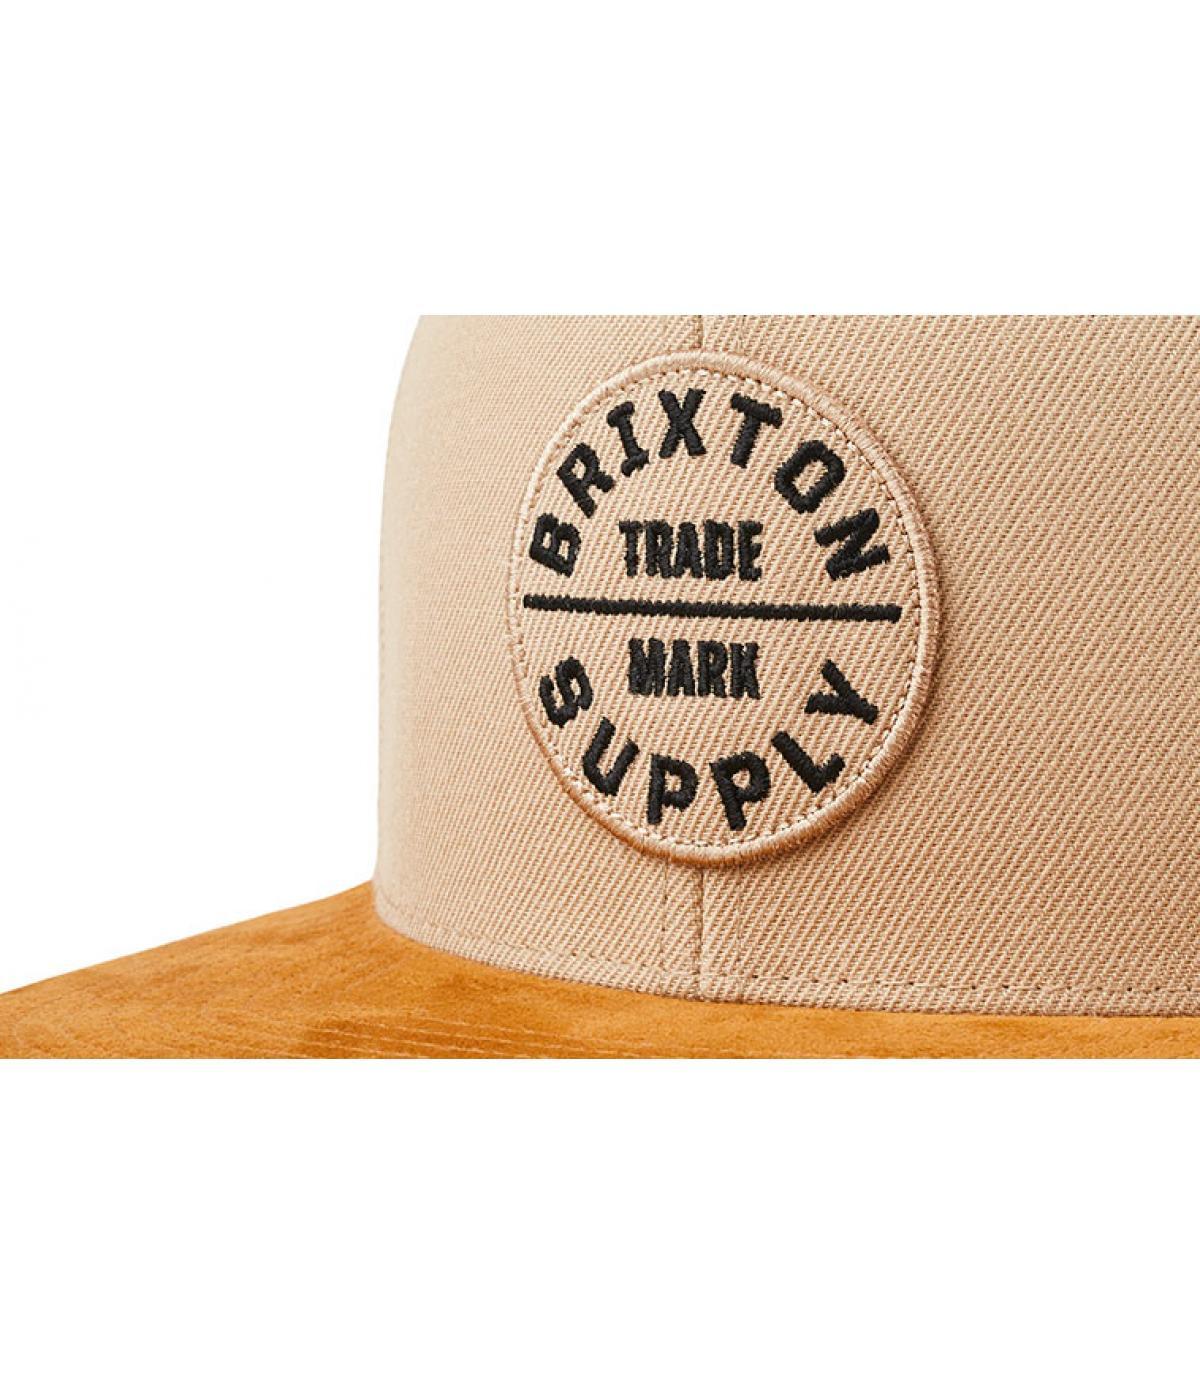 Dettagli Oath III khaki tan - image 3